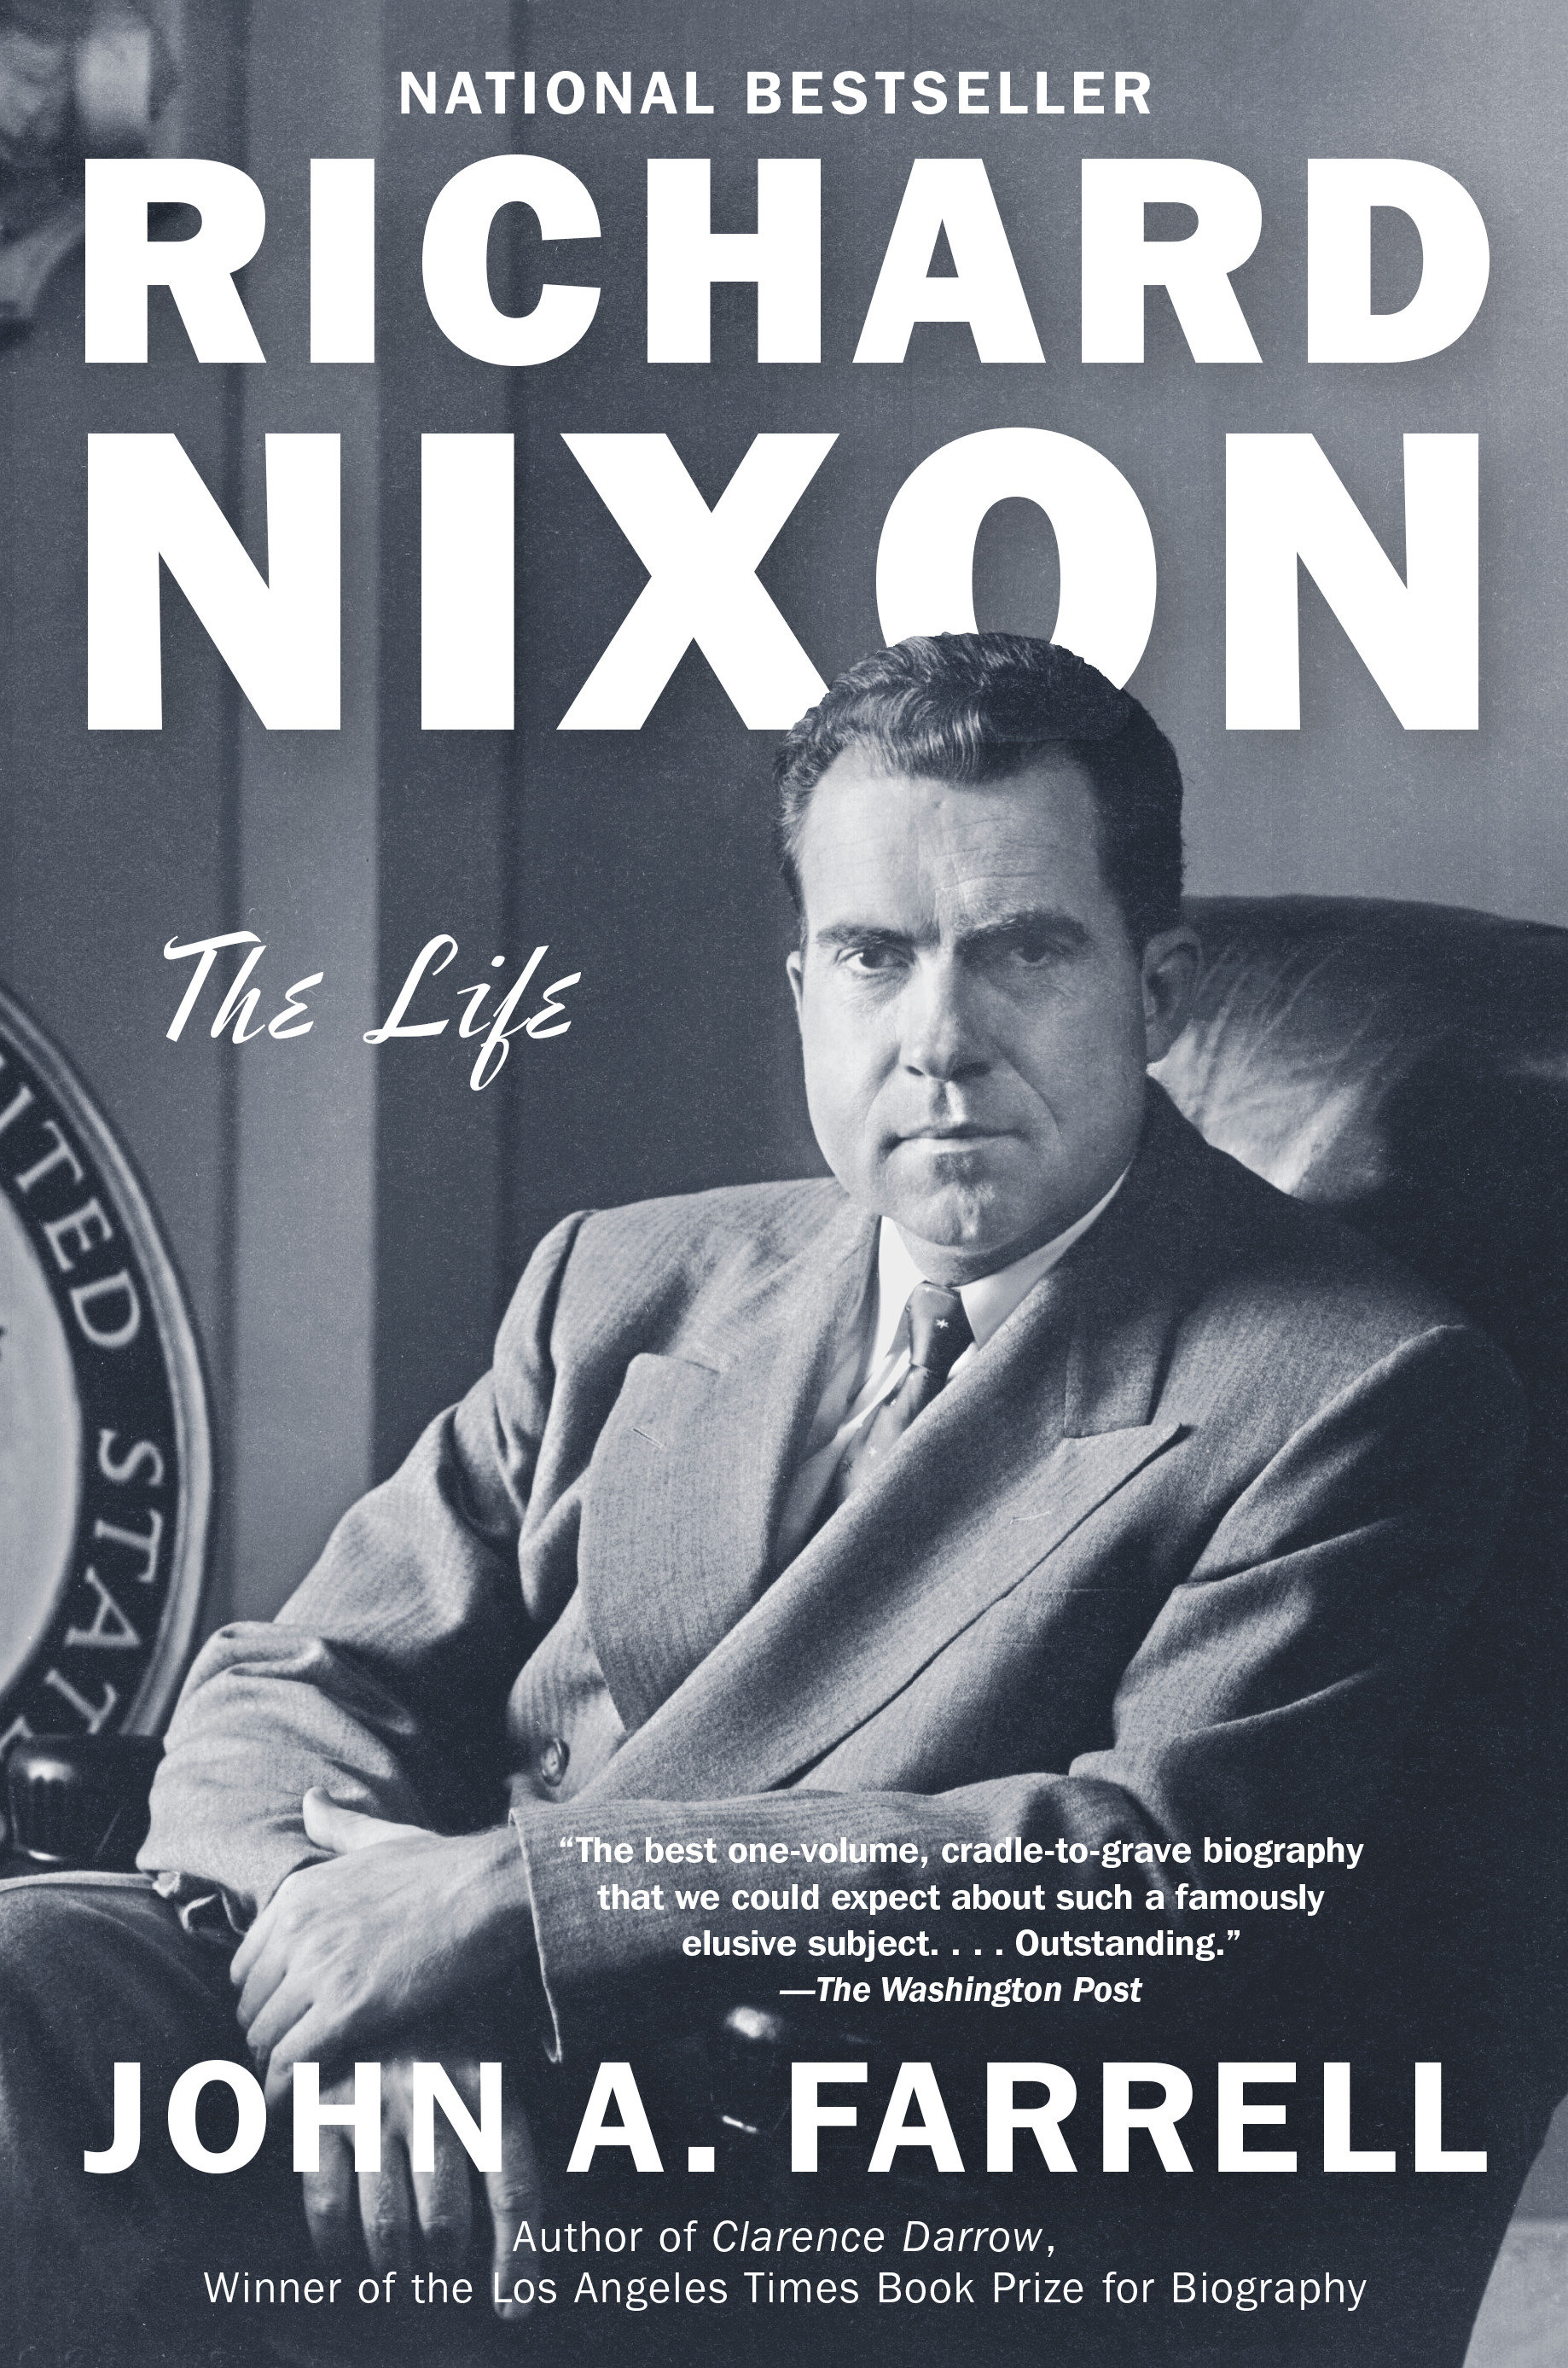 Richard Nixon the life cover image